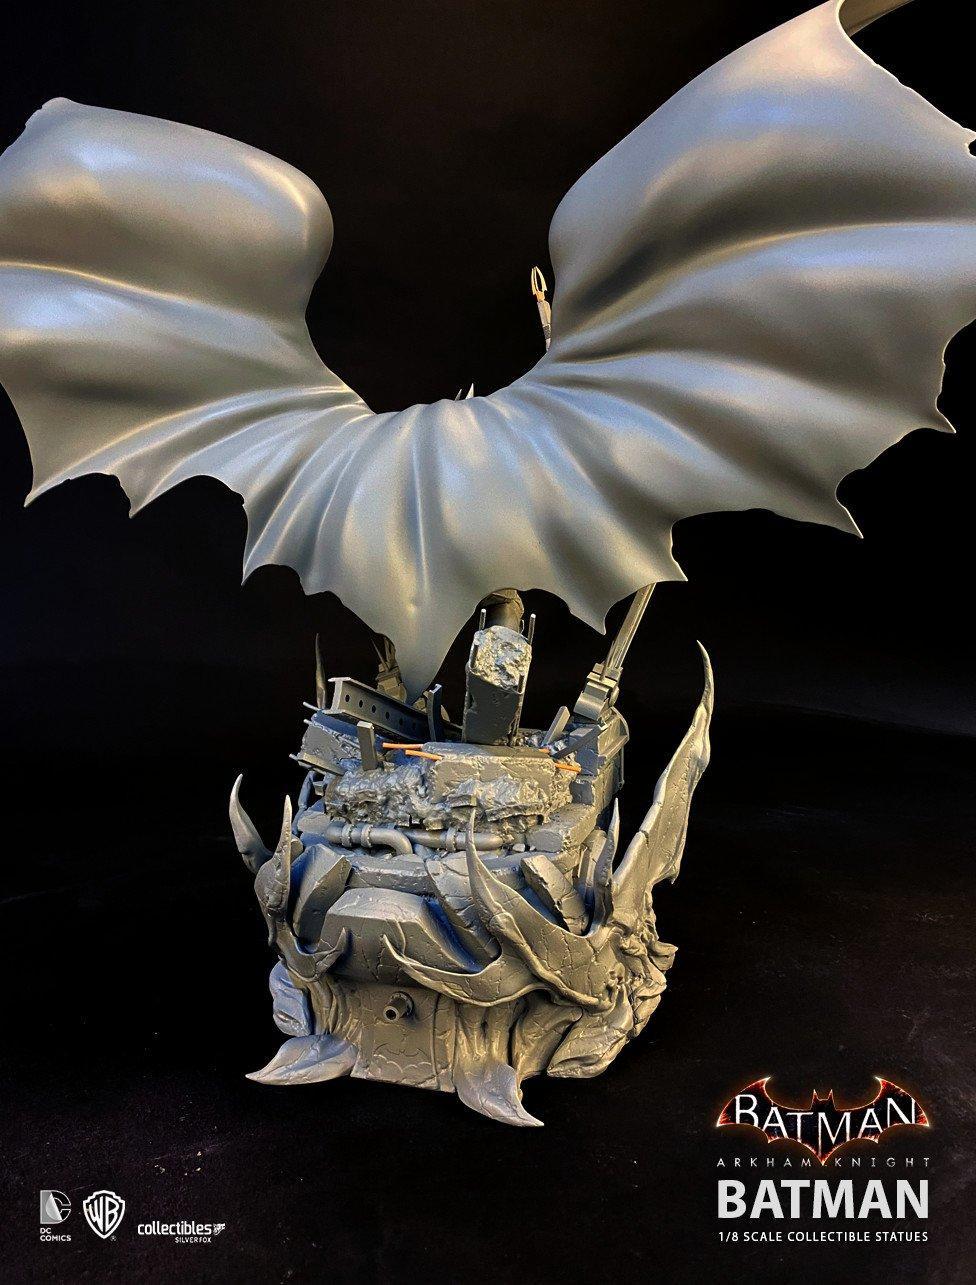 Batman siver fox collectibles batman arkham knight 1 8 scale statue6